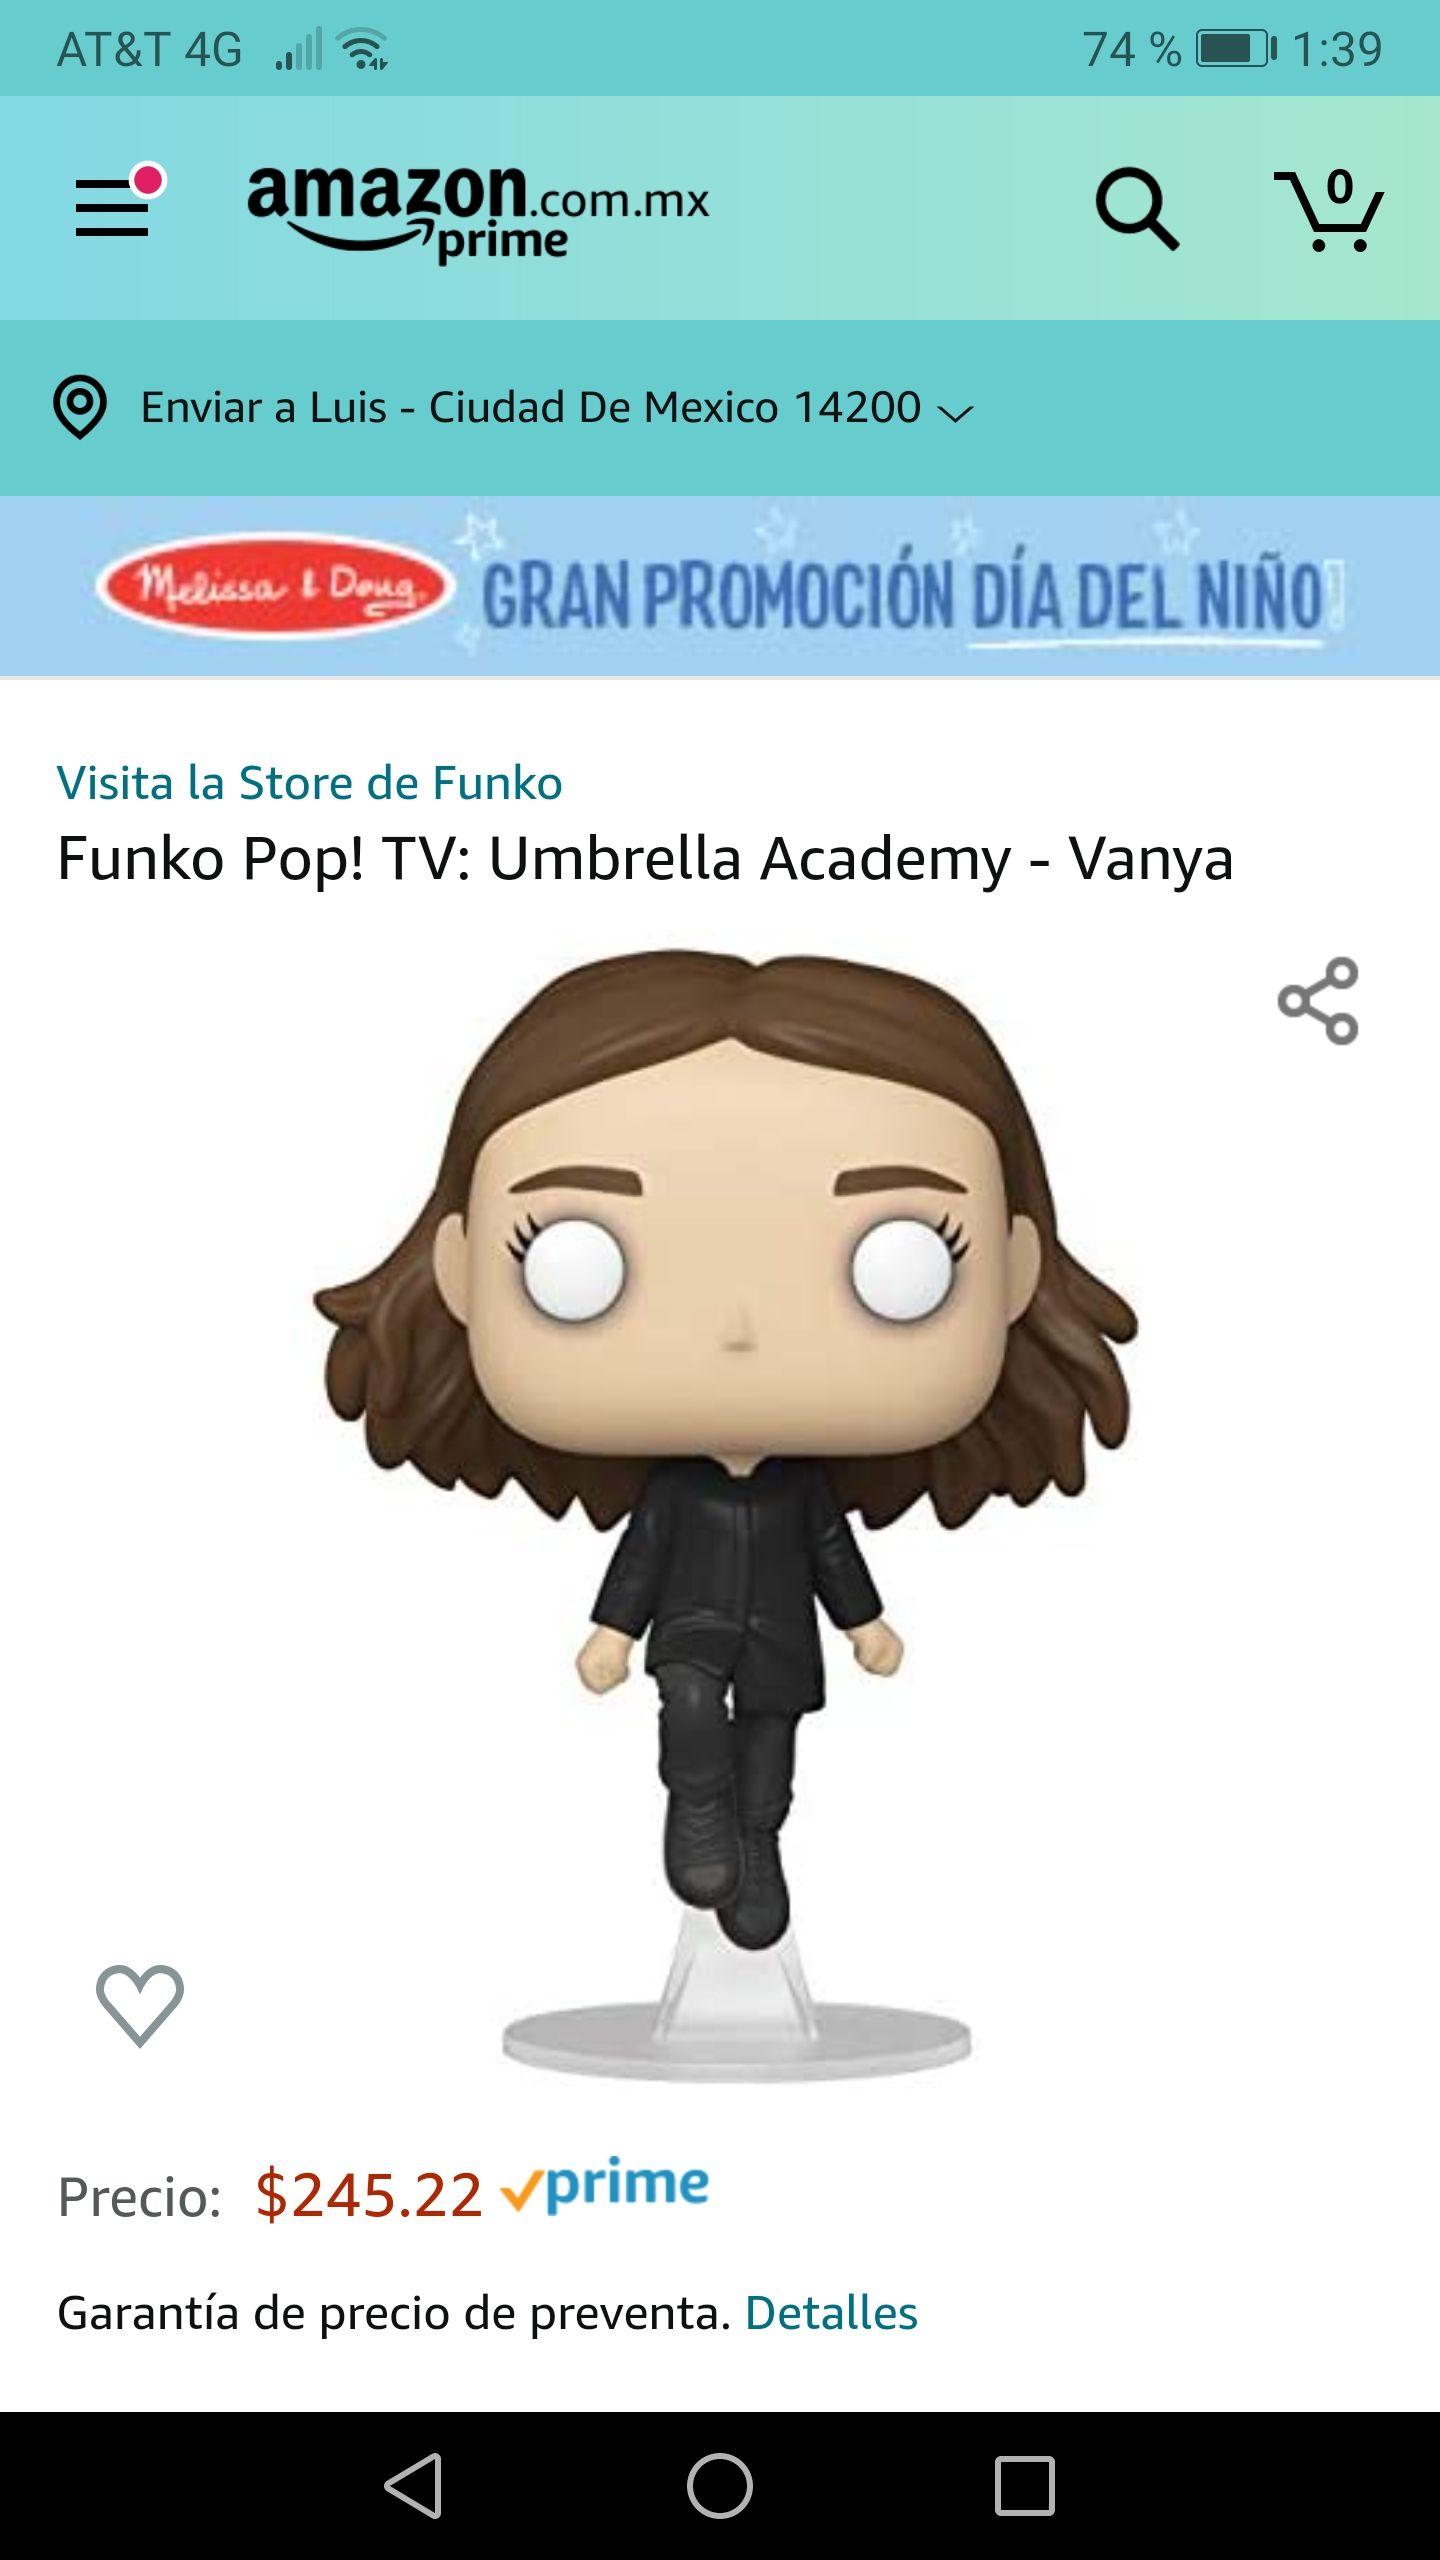 Amazon: Preventa - Funko Pop Umbrella Academy Vanya